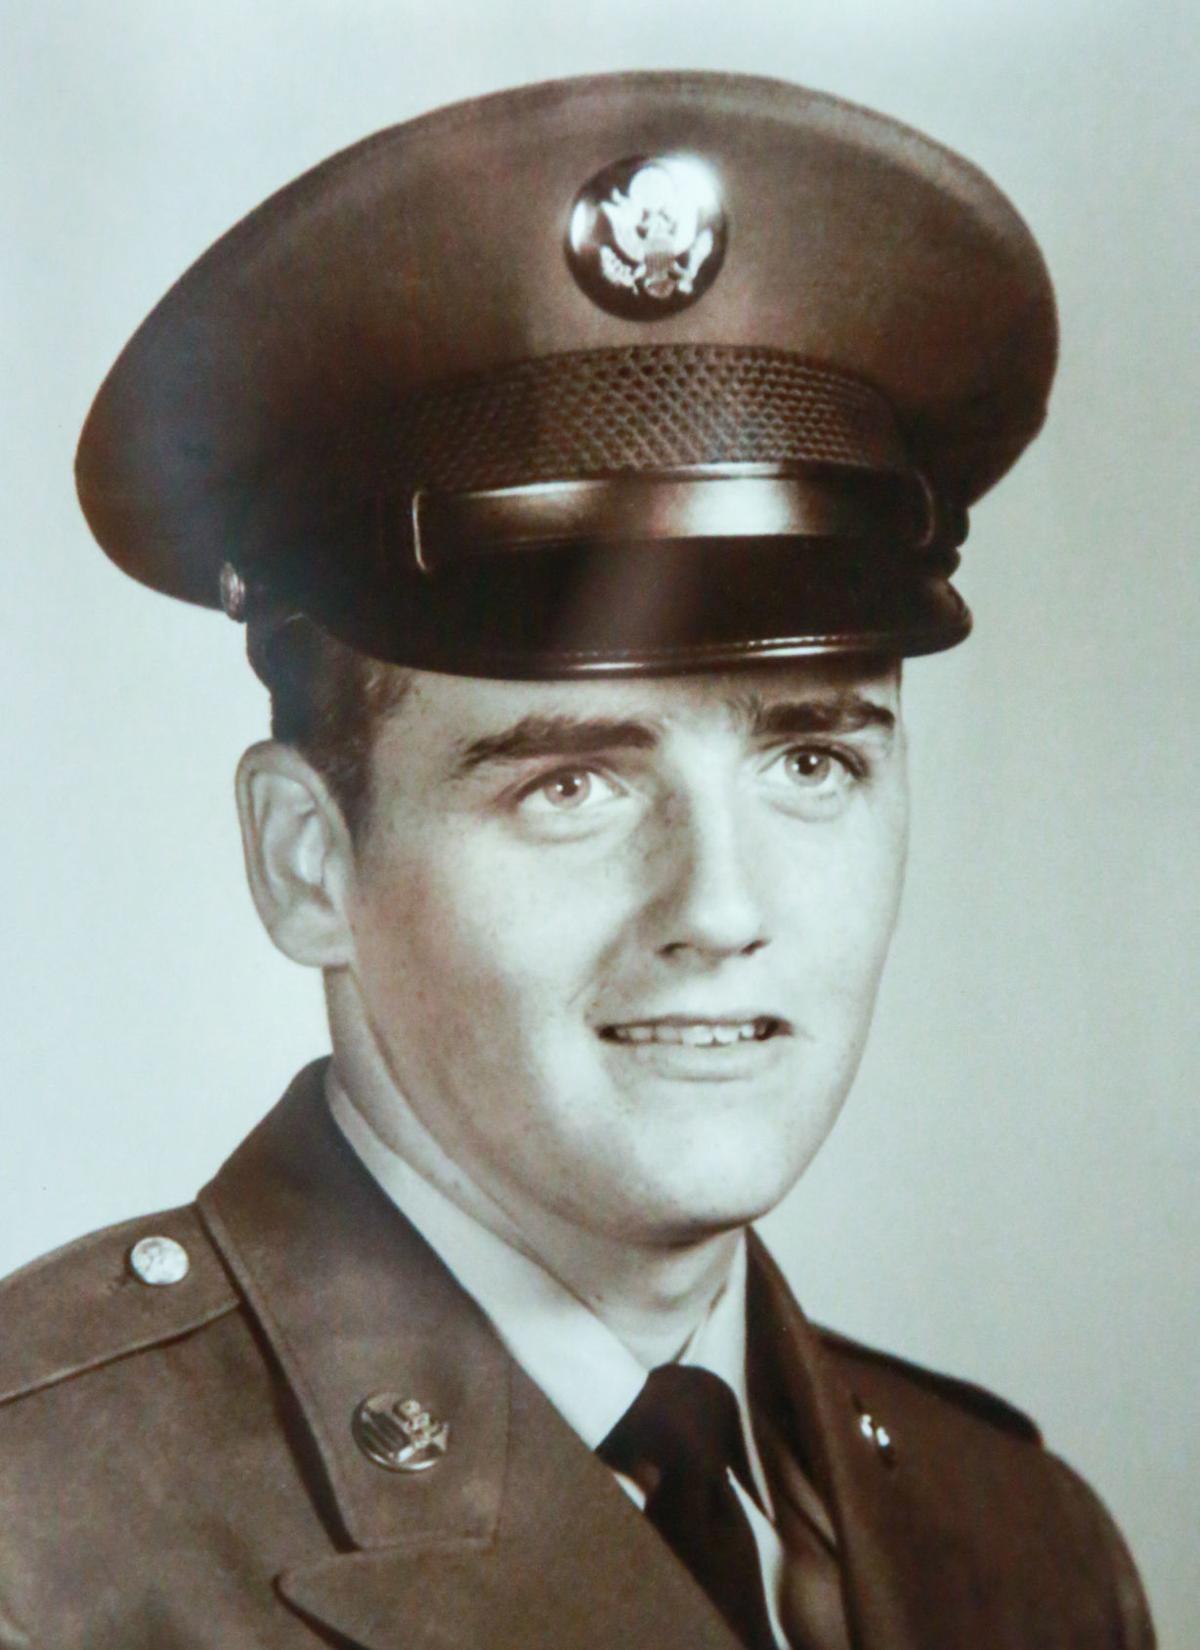 Stories of Honor: Sgt. Fredrick B. King